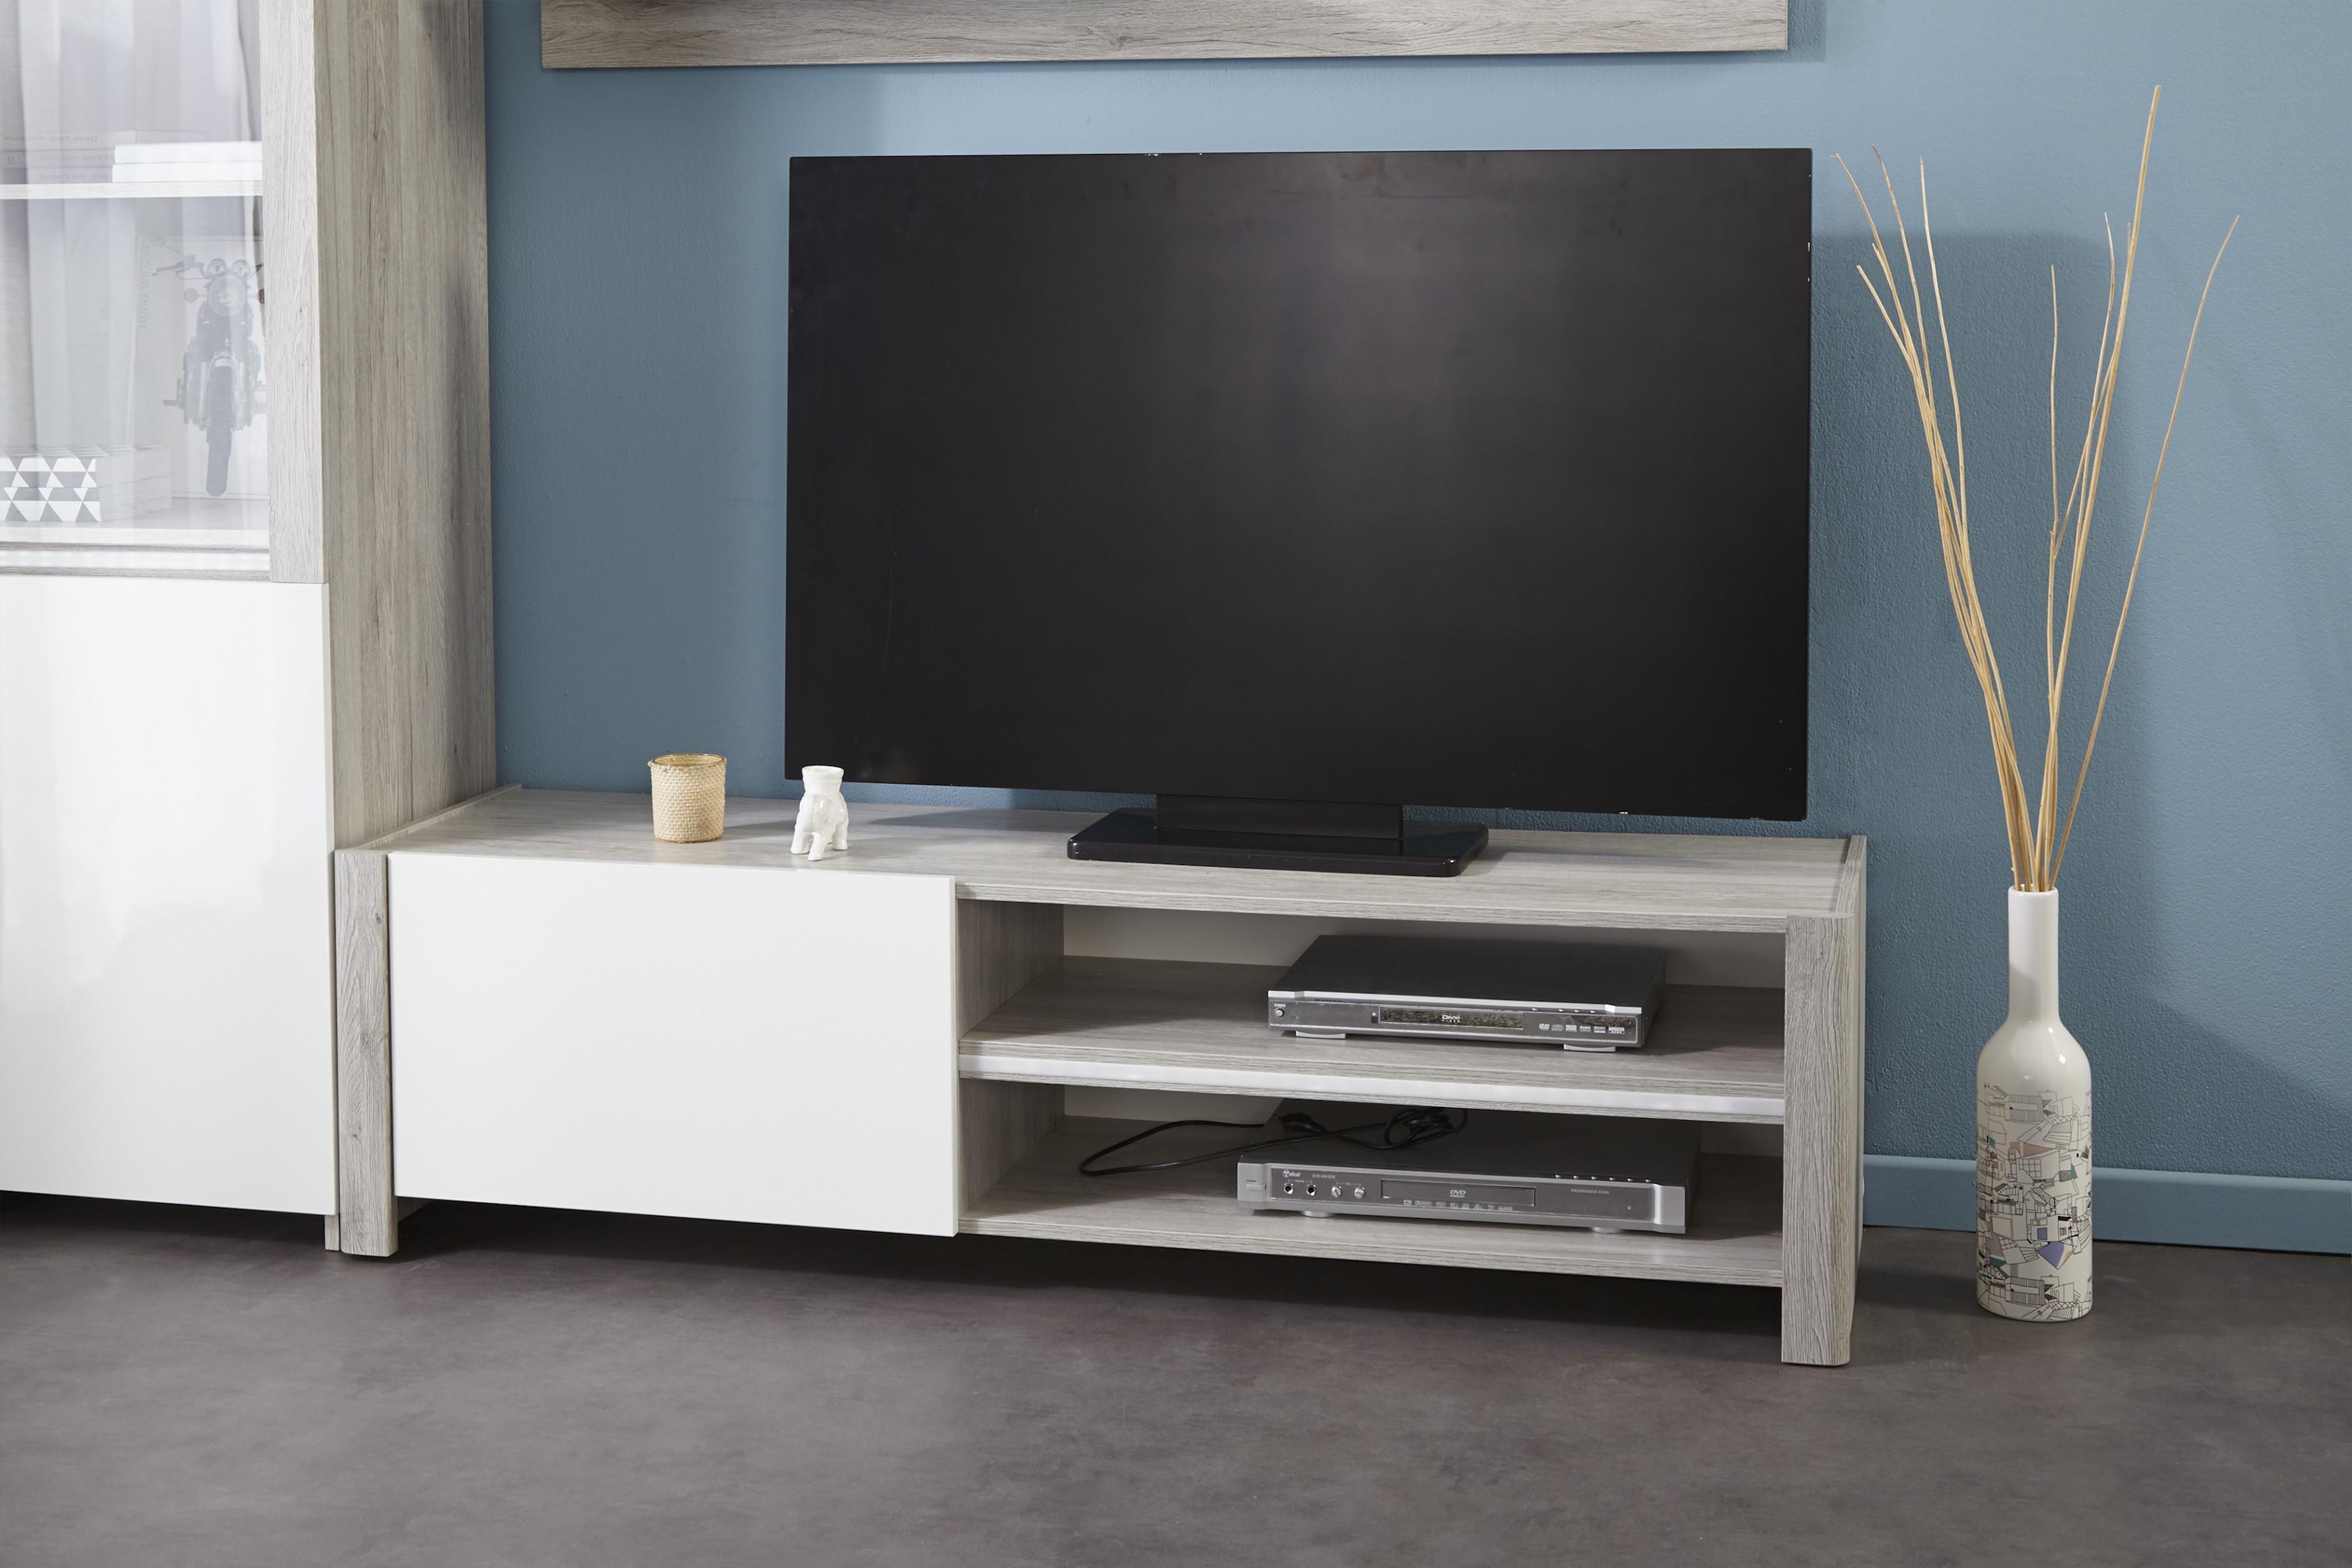 Meuble Tv V Nusia Gris Portofino Et Blanc Brillant Prix Discount # Meuble Tv H Et H